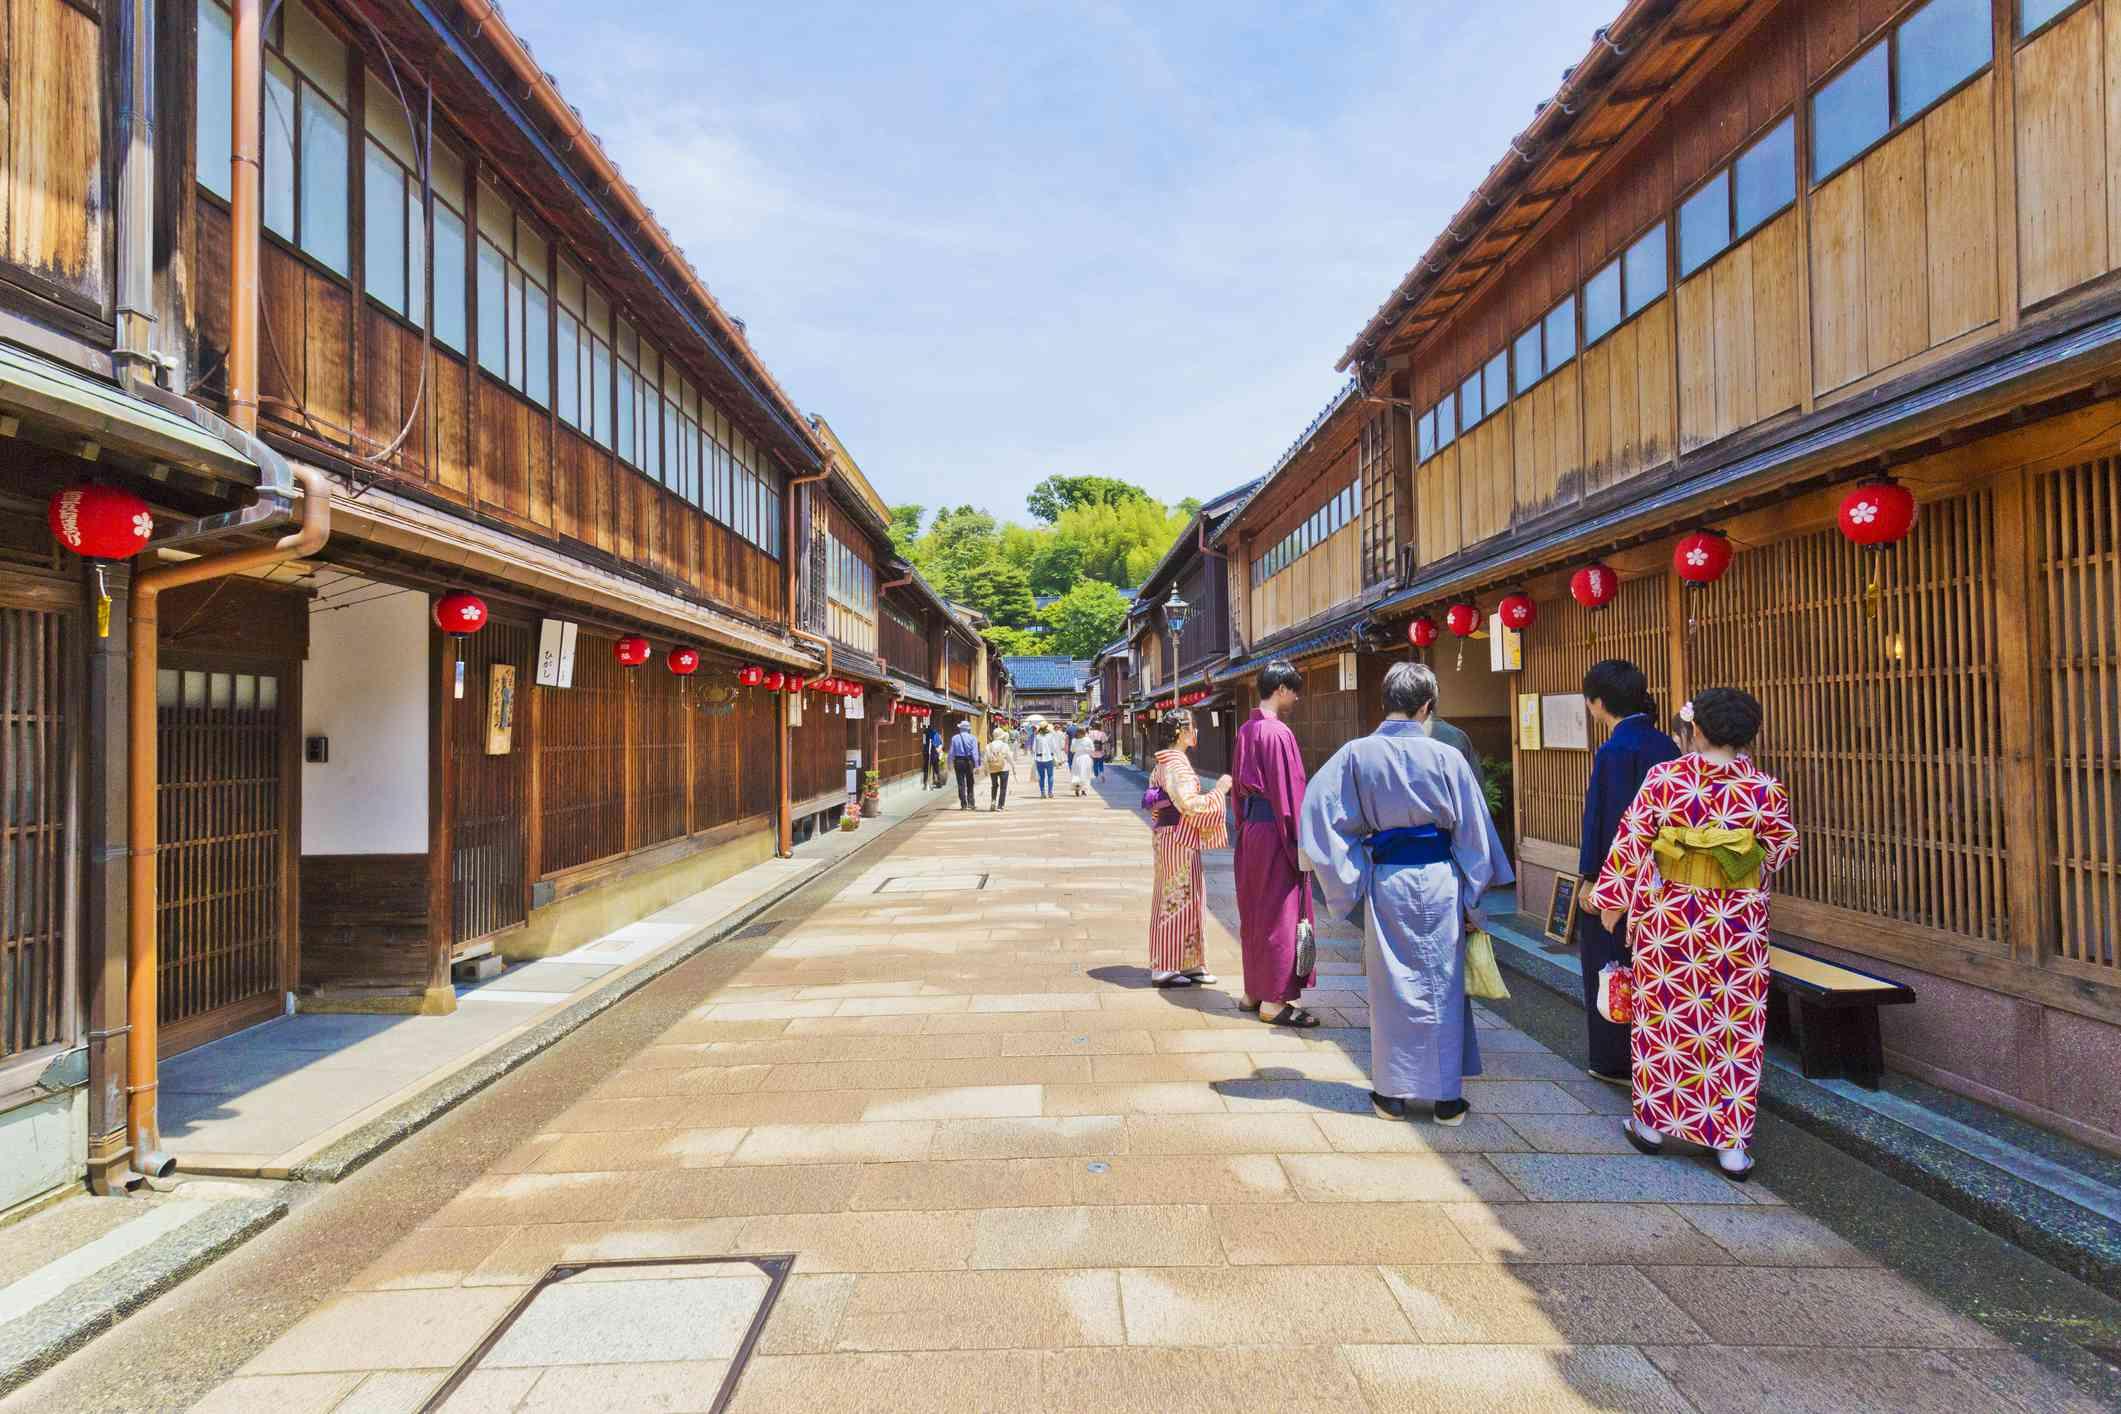 Geisha and men in traditional Japanese dress outside teahouses in Kanagawa's Higashi Chaya District